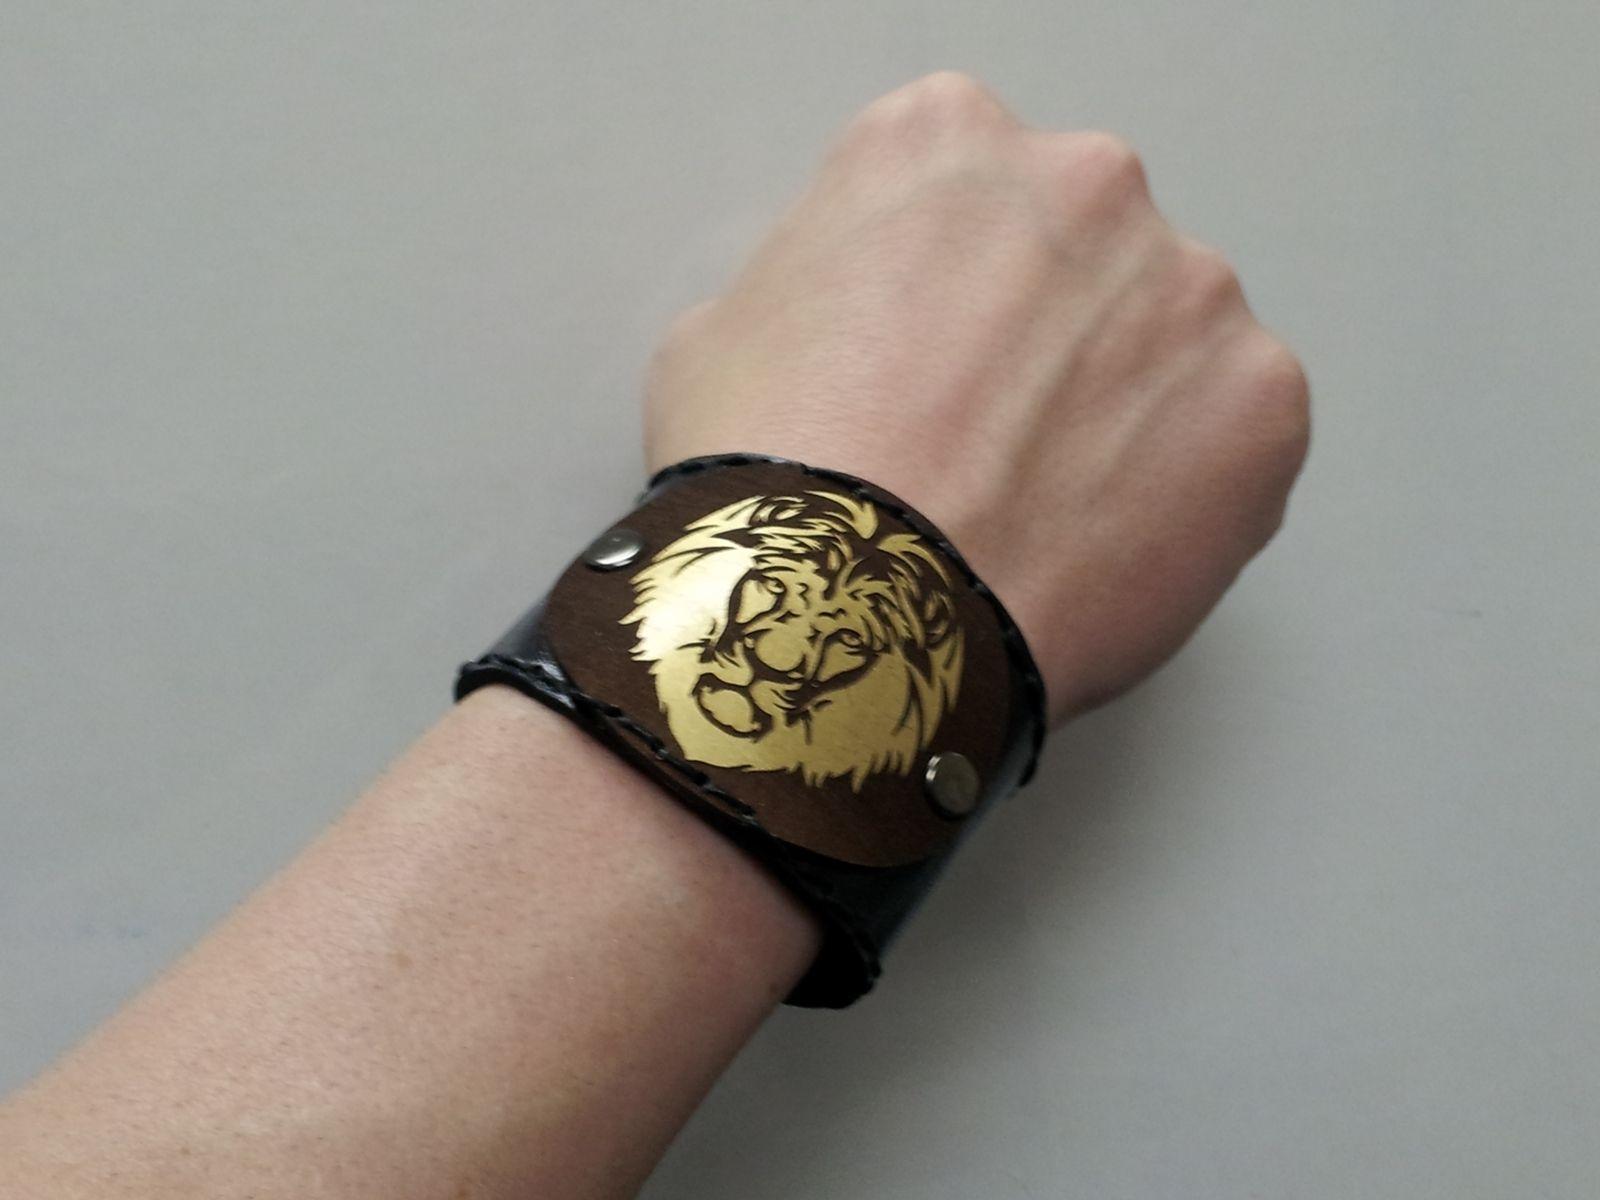 Custom Laser Cut Leather Wrist Cuff By Just Graphics Inc